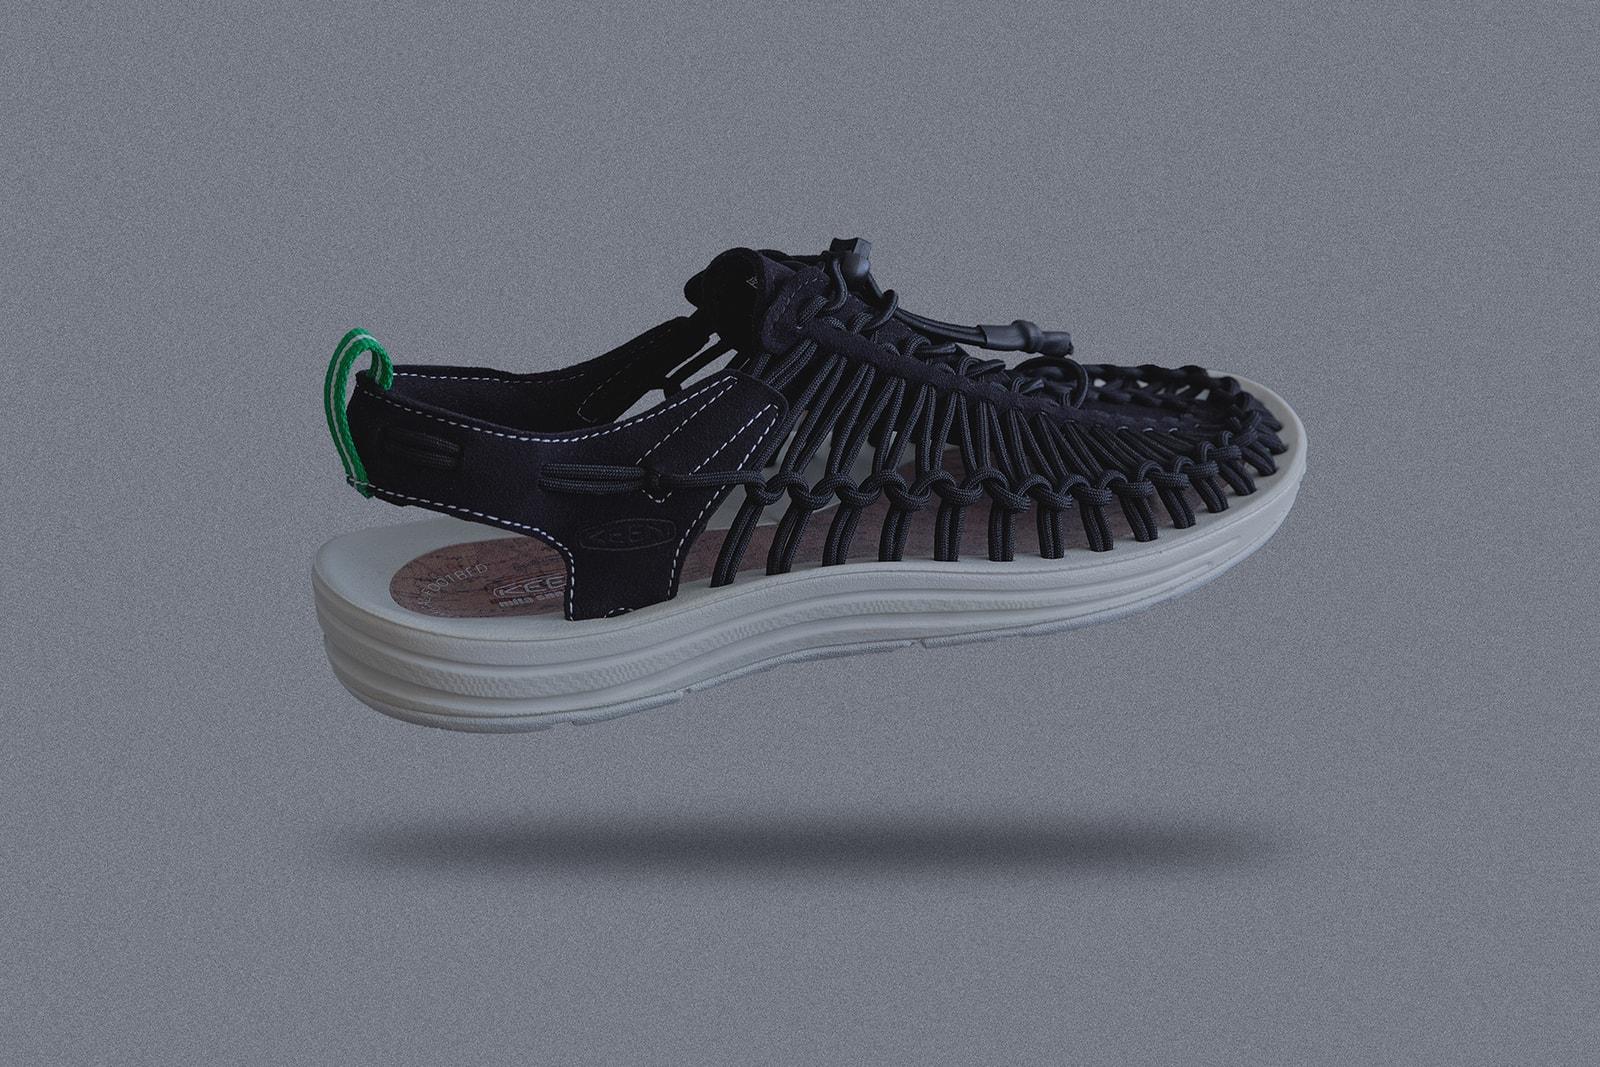 mita sneakers x KEEN 全新 UNEEK 聯名系列正式上架